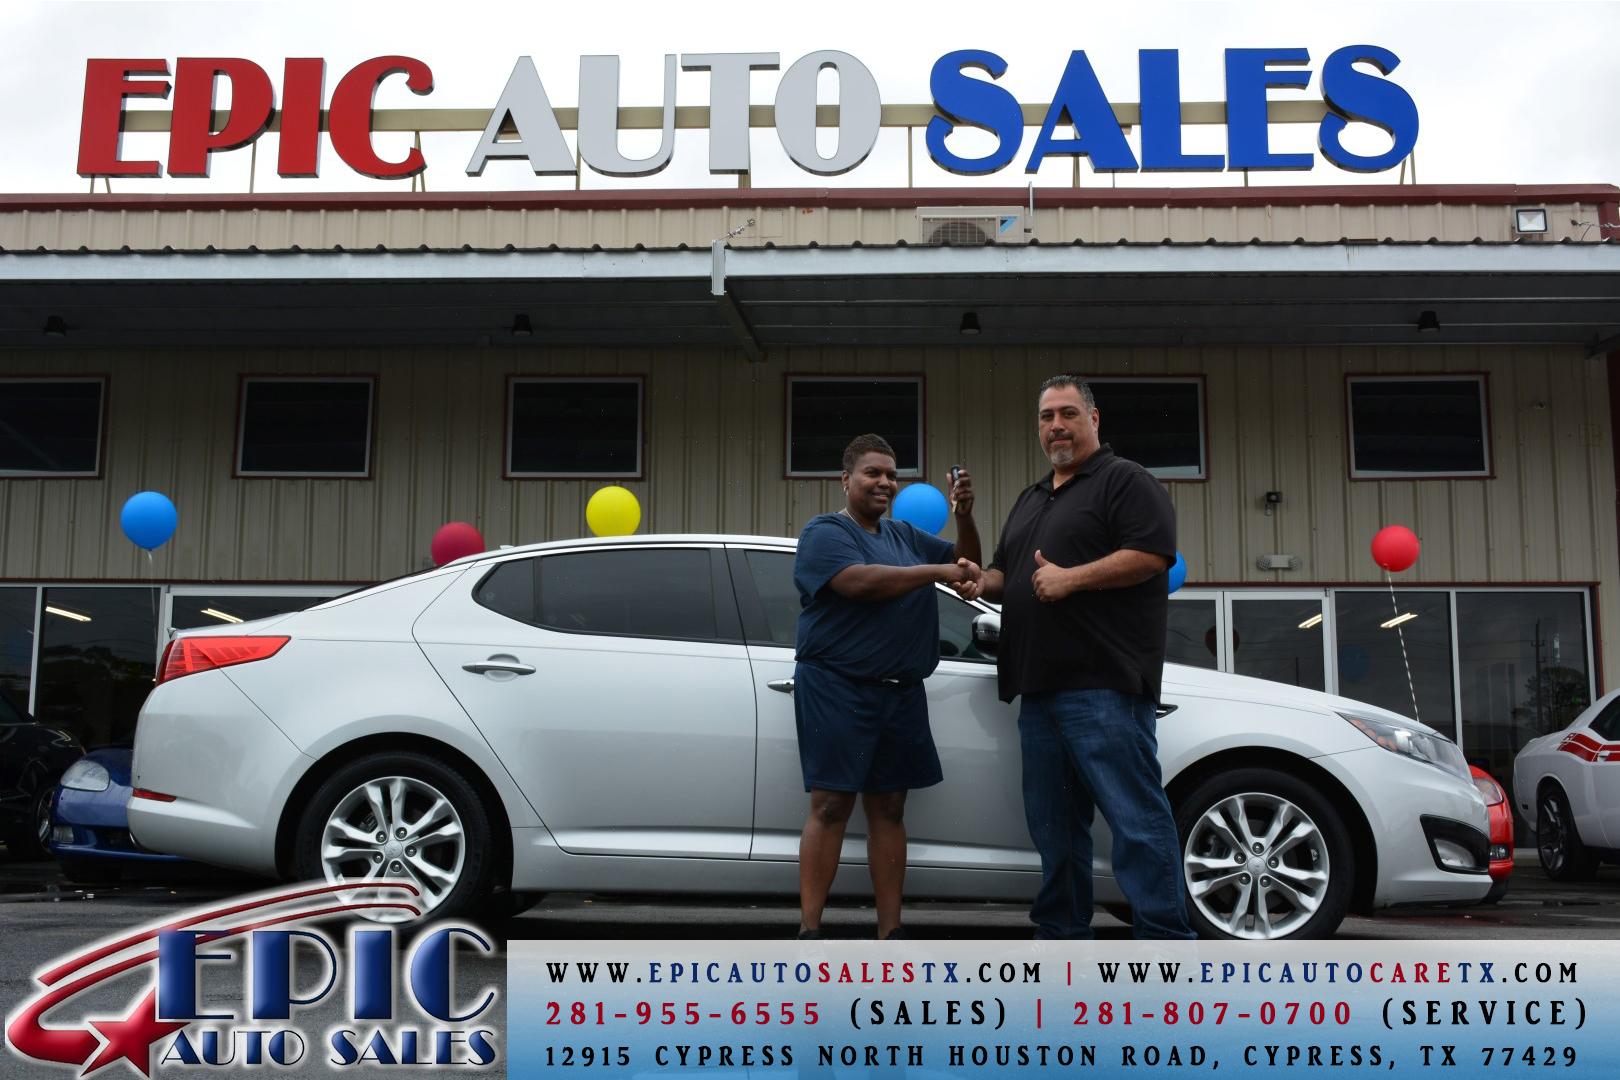 Epic Auto Sales image 7